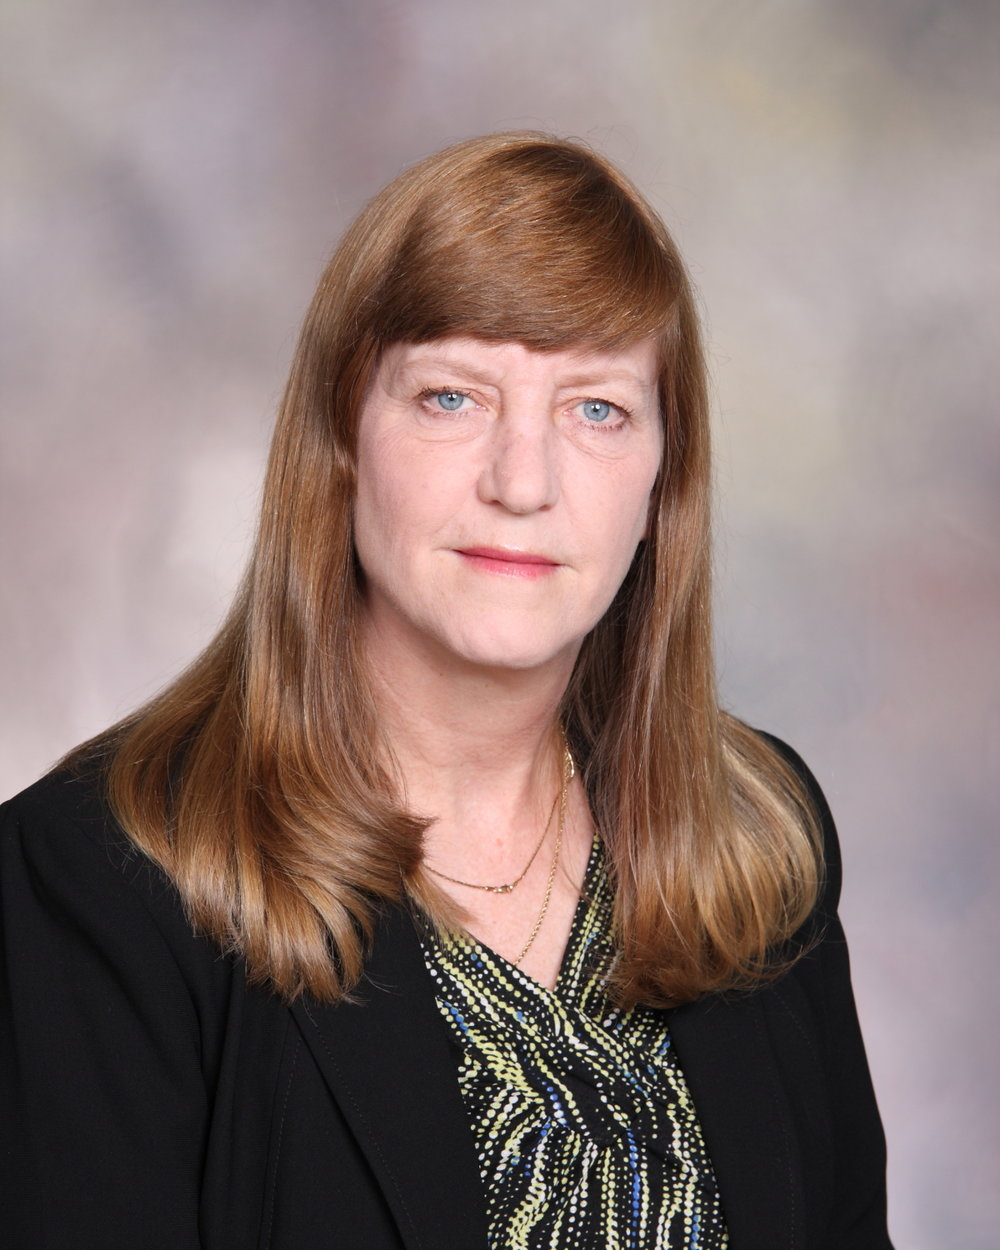 Cheryl Lovell_St Louis Housing Authority Executive Director.JPG